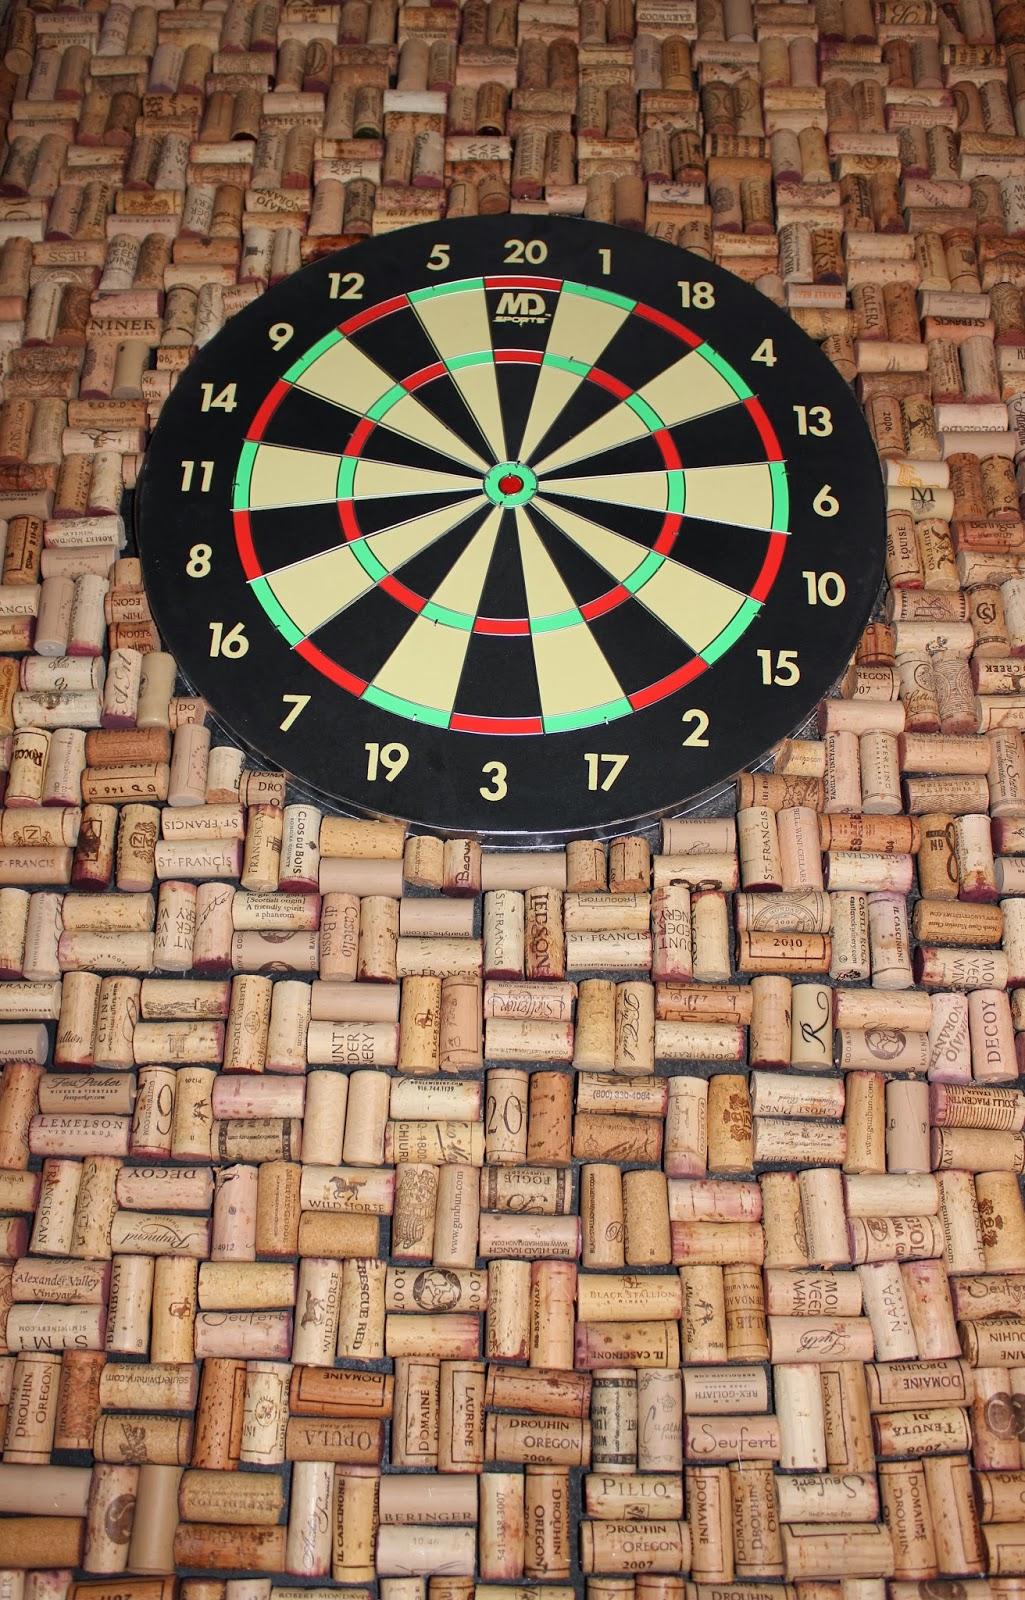 tice 39 s tidbits diy wine cork dart board. Black Bedroom Furniture Sets. Home Design Ideas